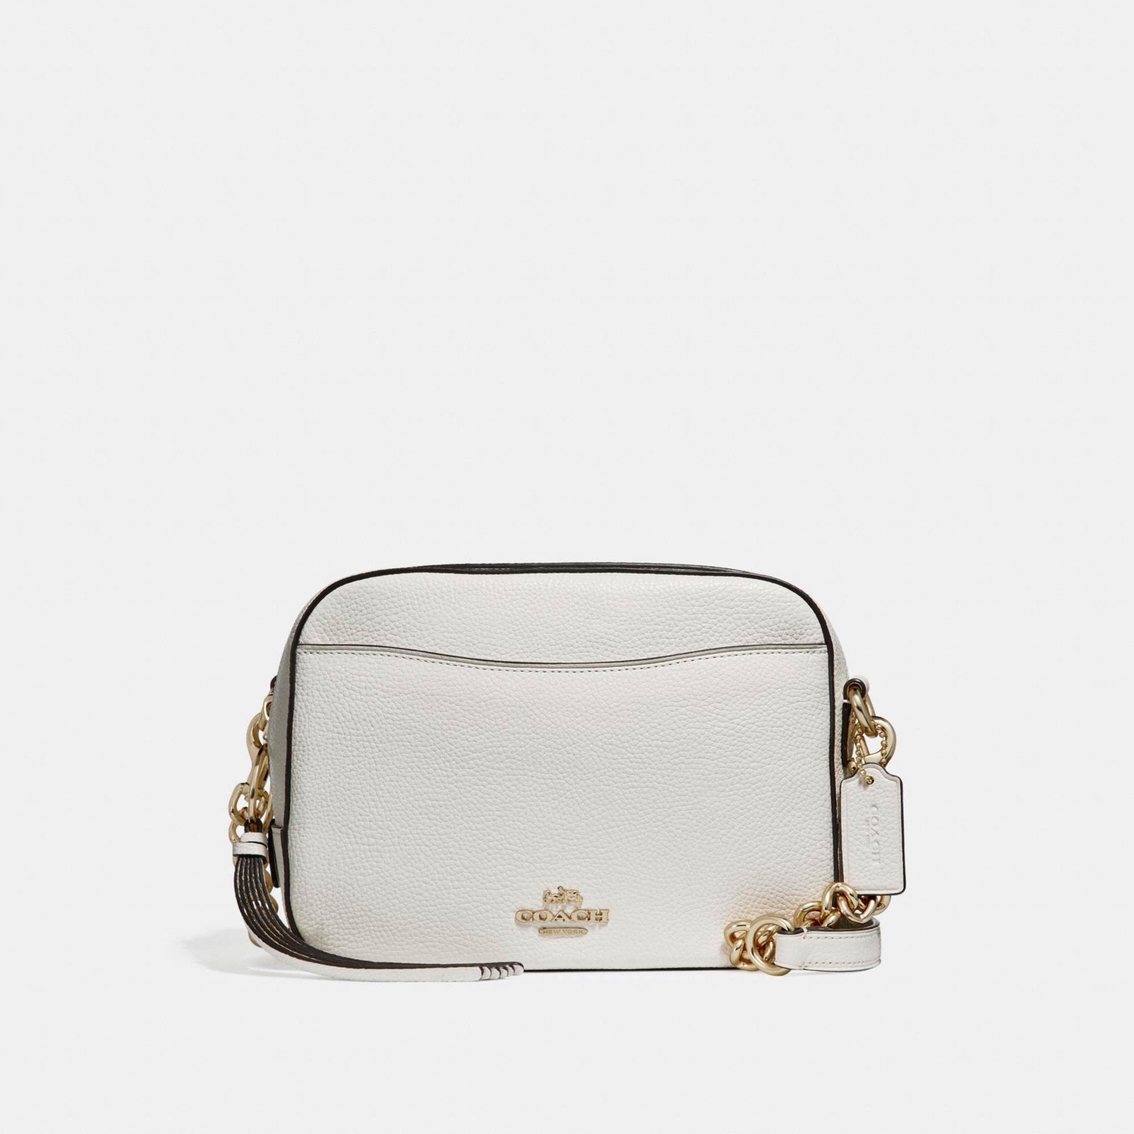 Coach Leather Camera Bag   Crossbody Bags   Handbags   Accessories ... 0ffc3a5cff